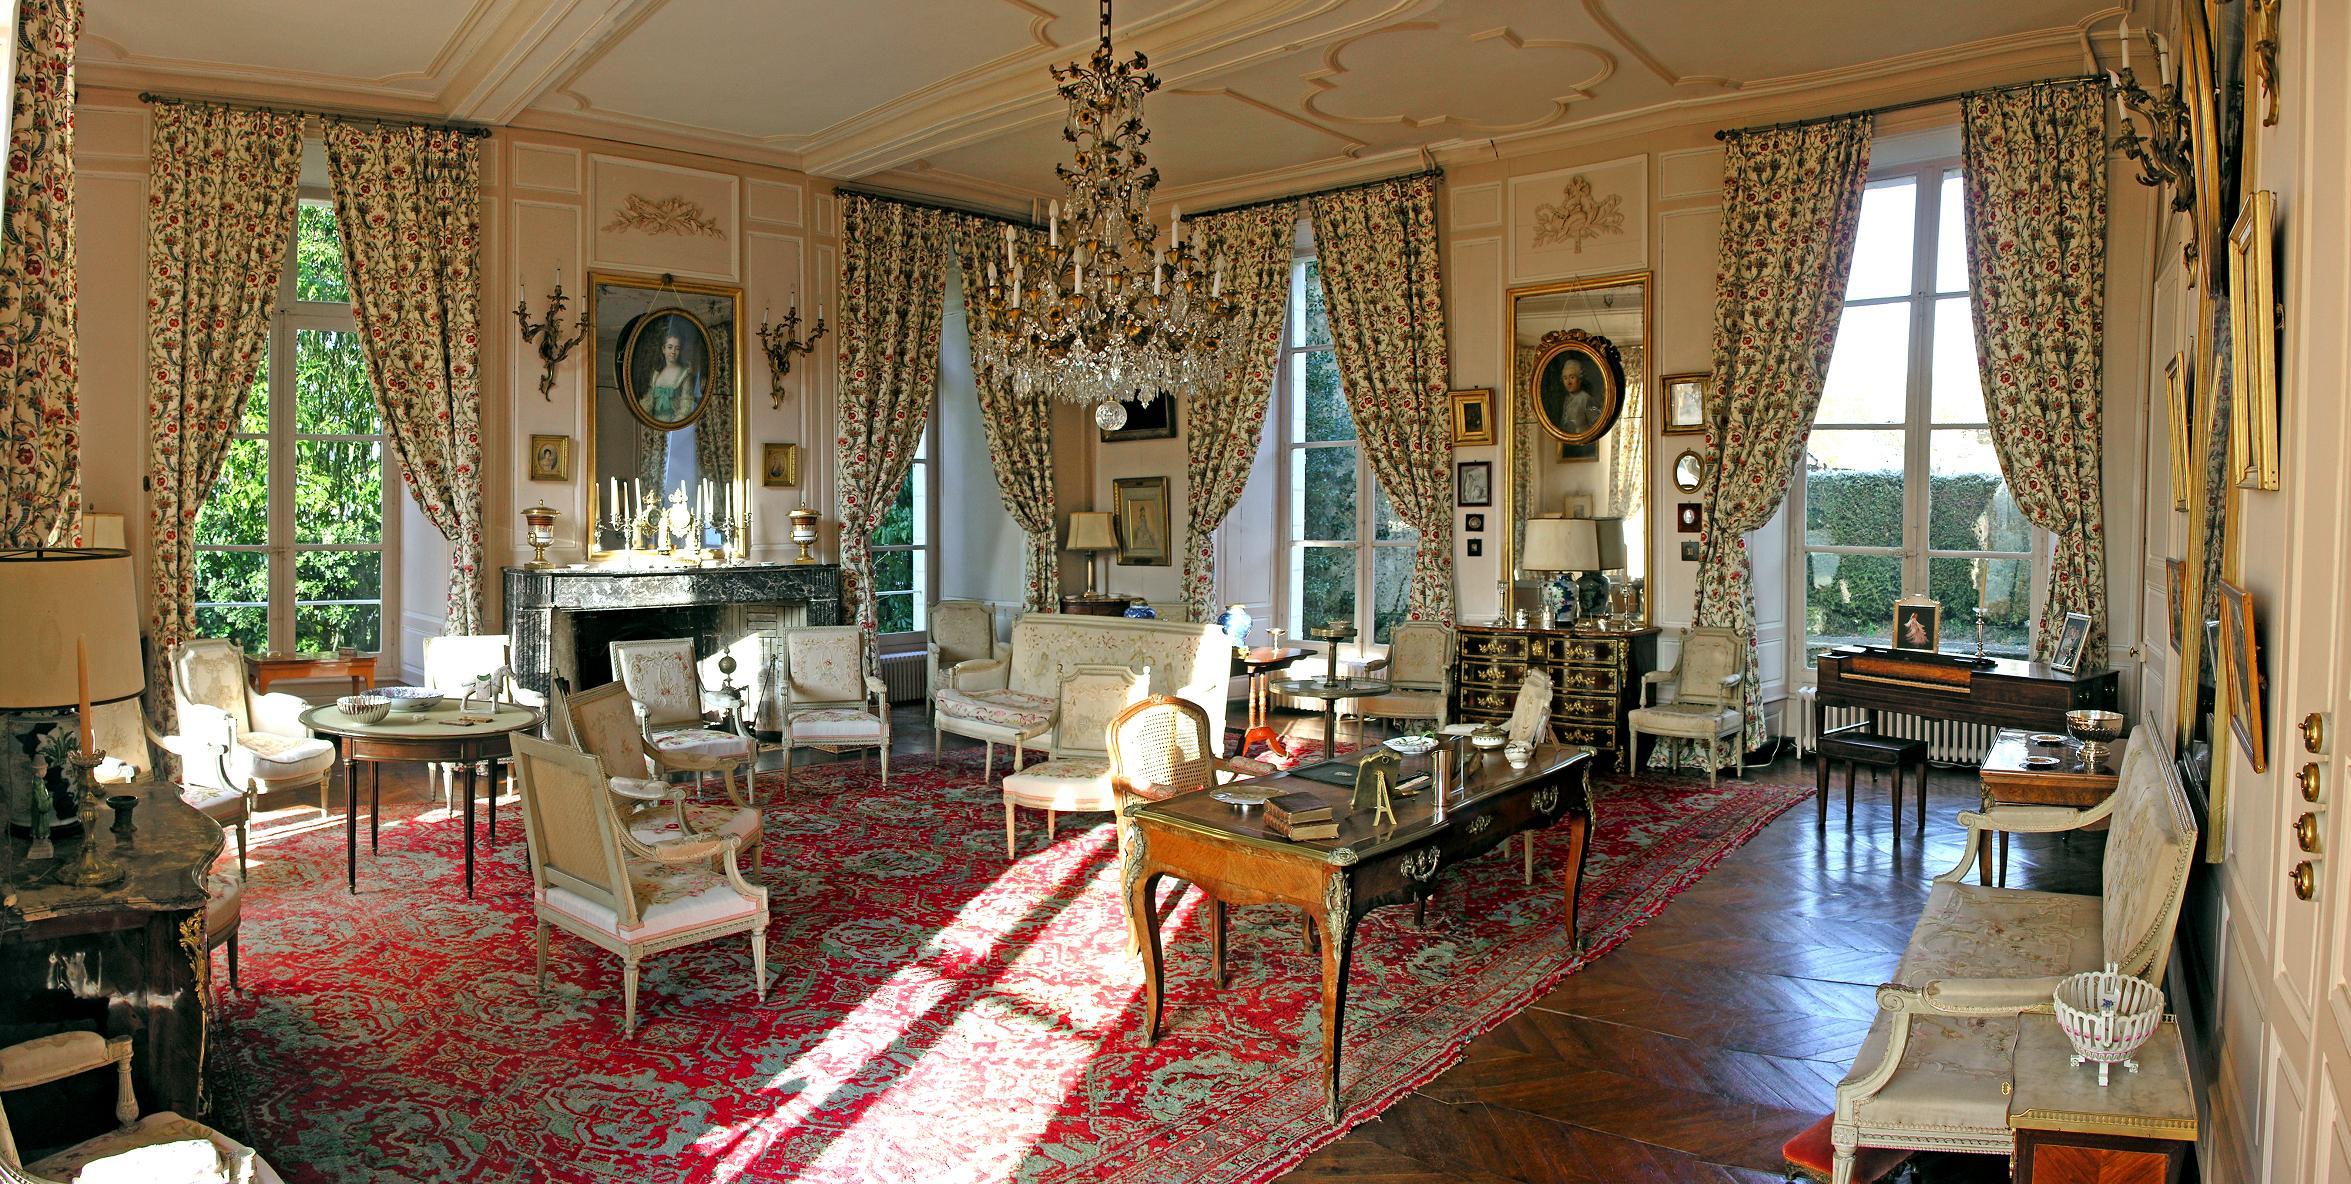 salon-chateau-barre-hotel-vanssay-loire-france